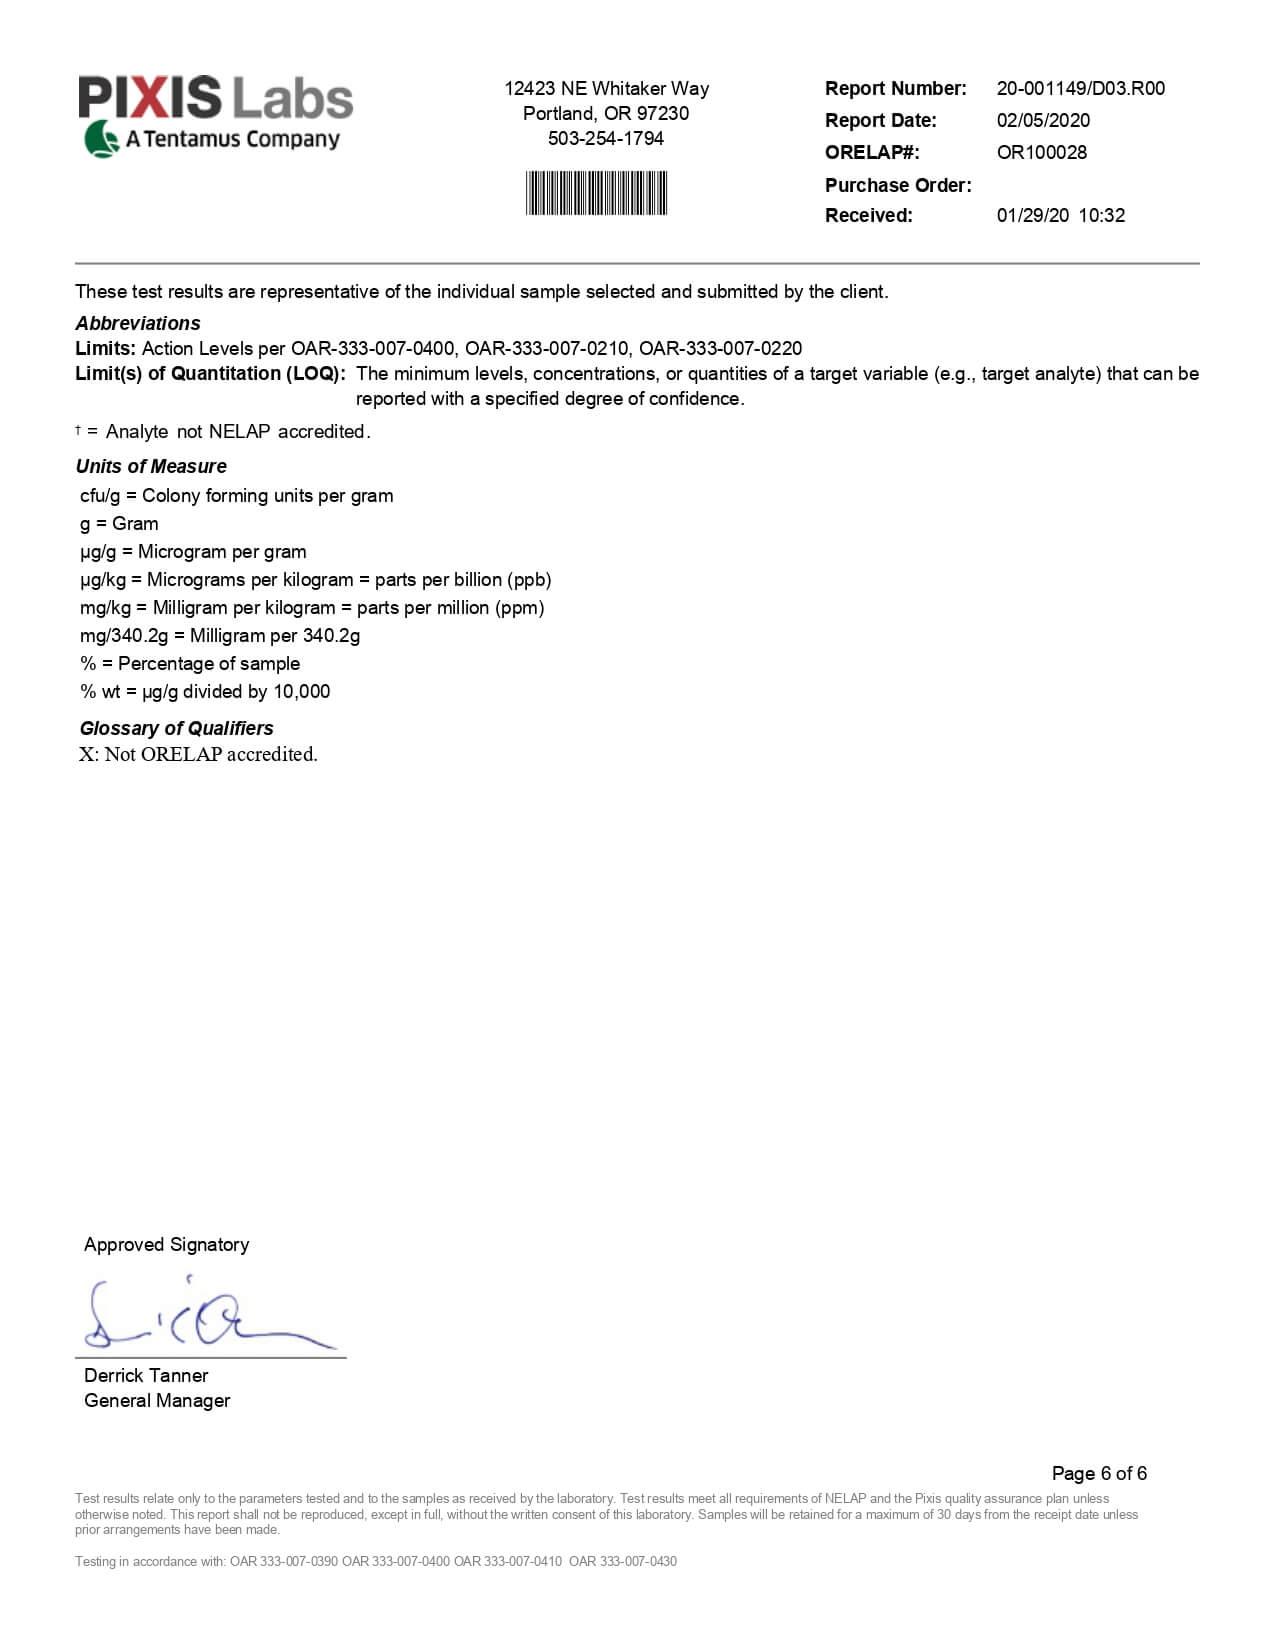 Social CBD Rest Body Lotion 300mg Lab Report